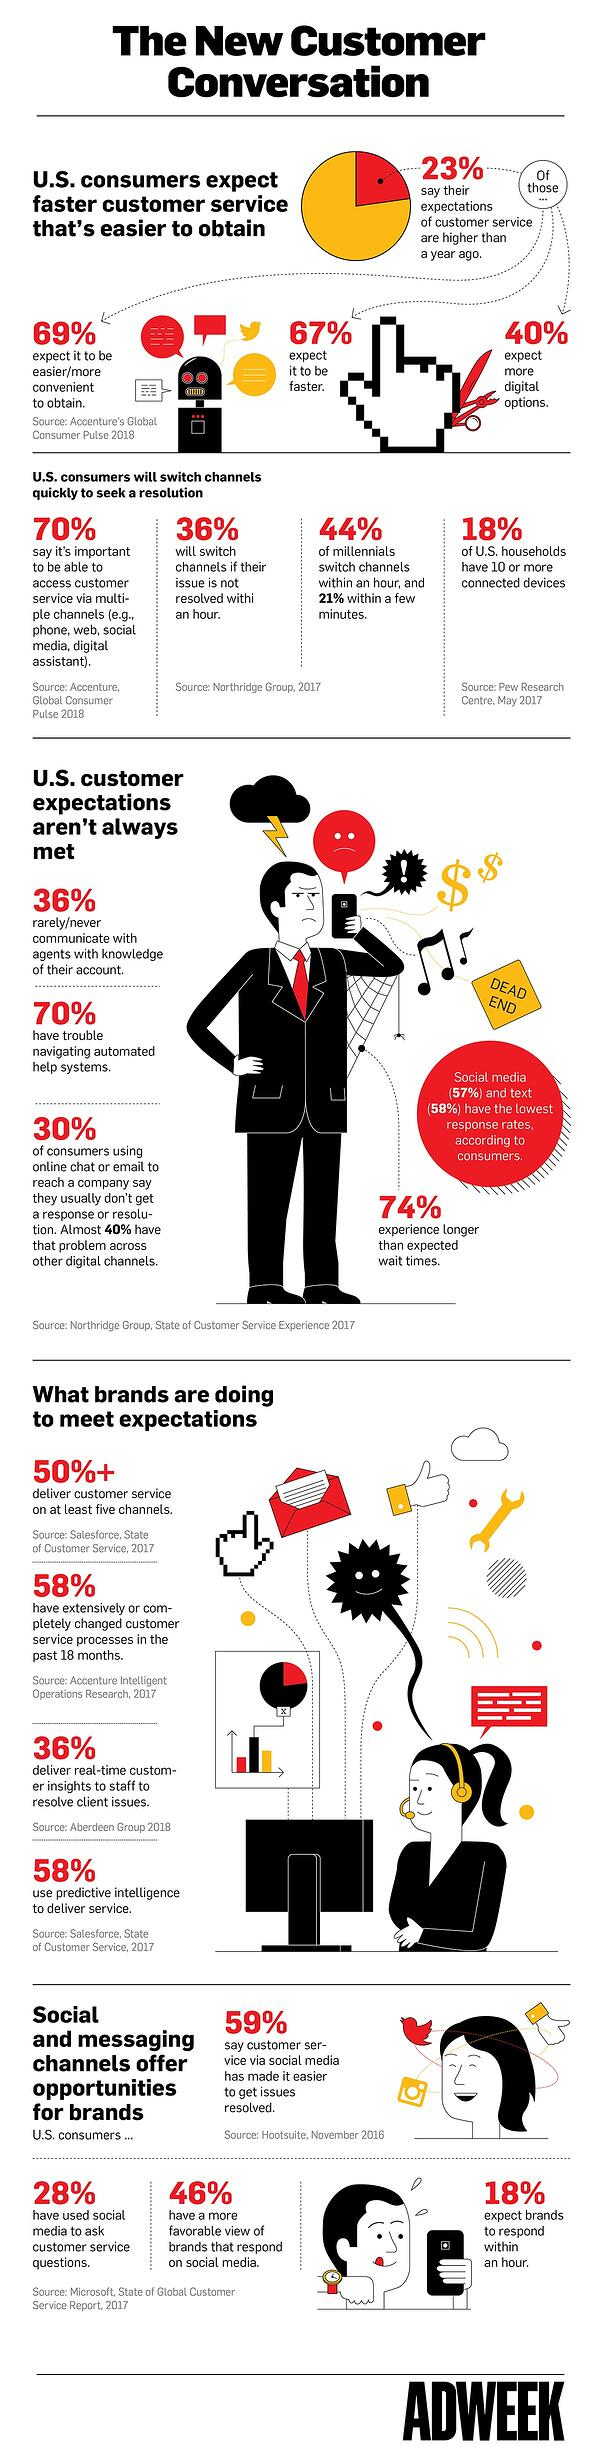 accenture-interactive-the-new-customer-conversation